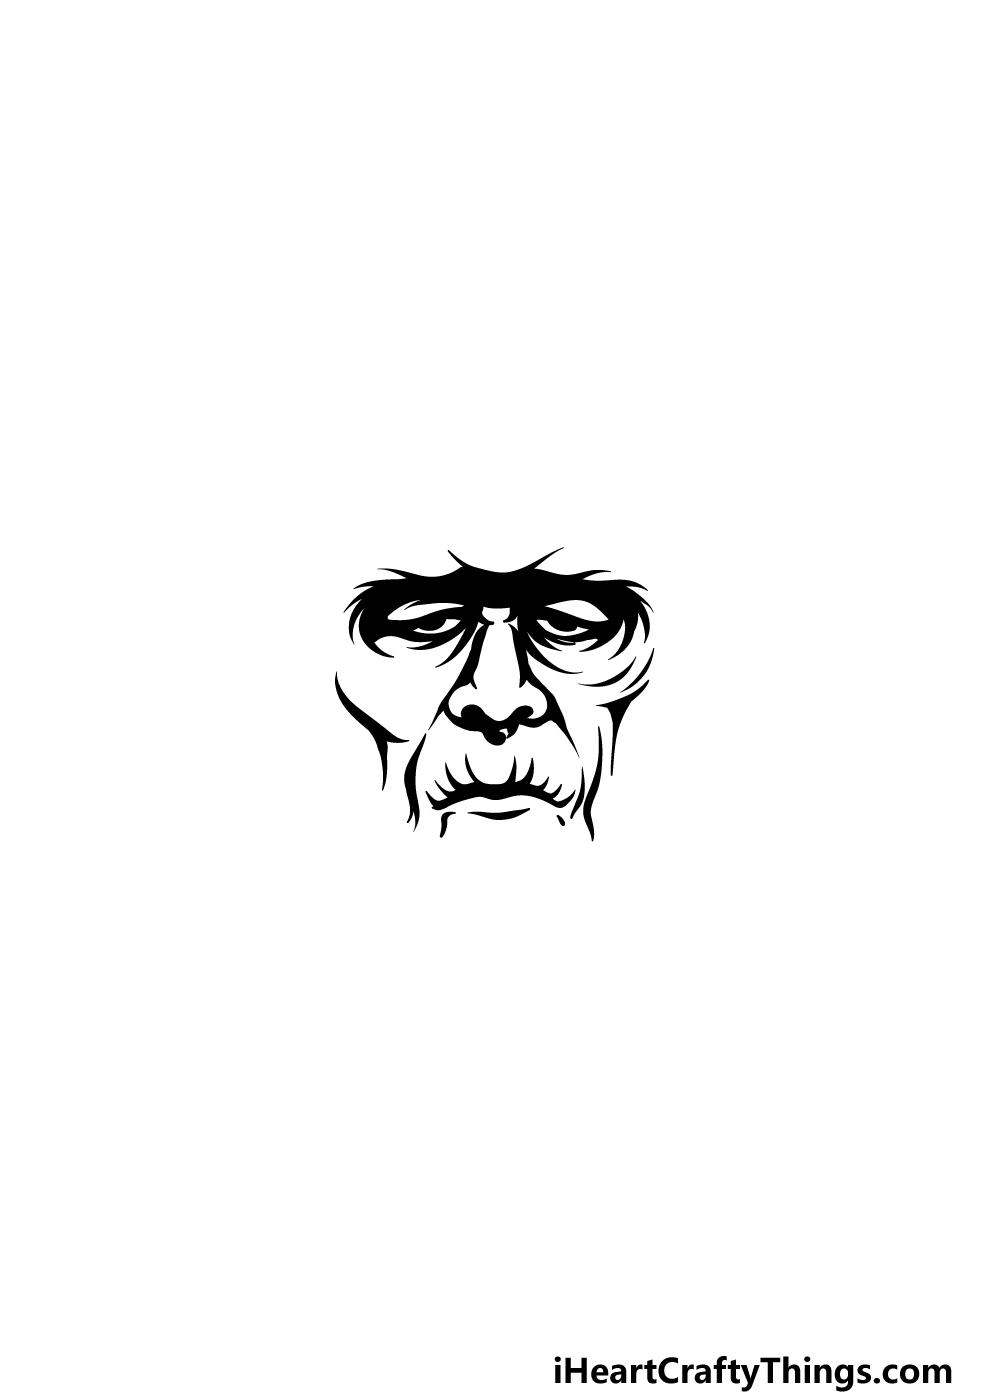 Drawing Frankenstein step 2